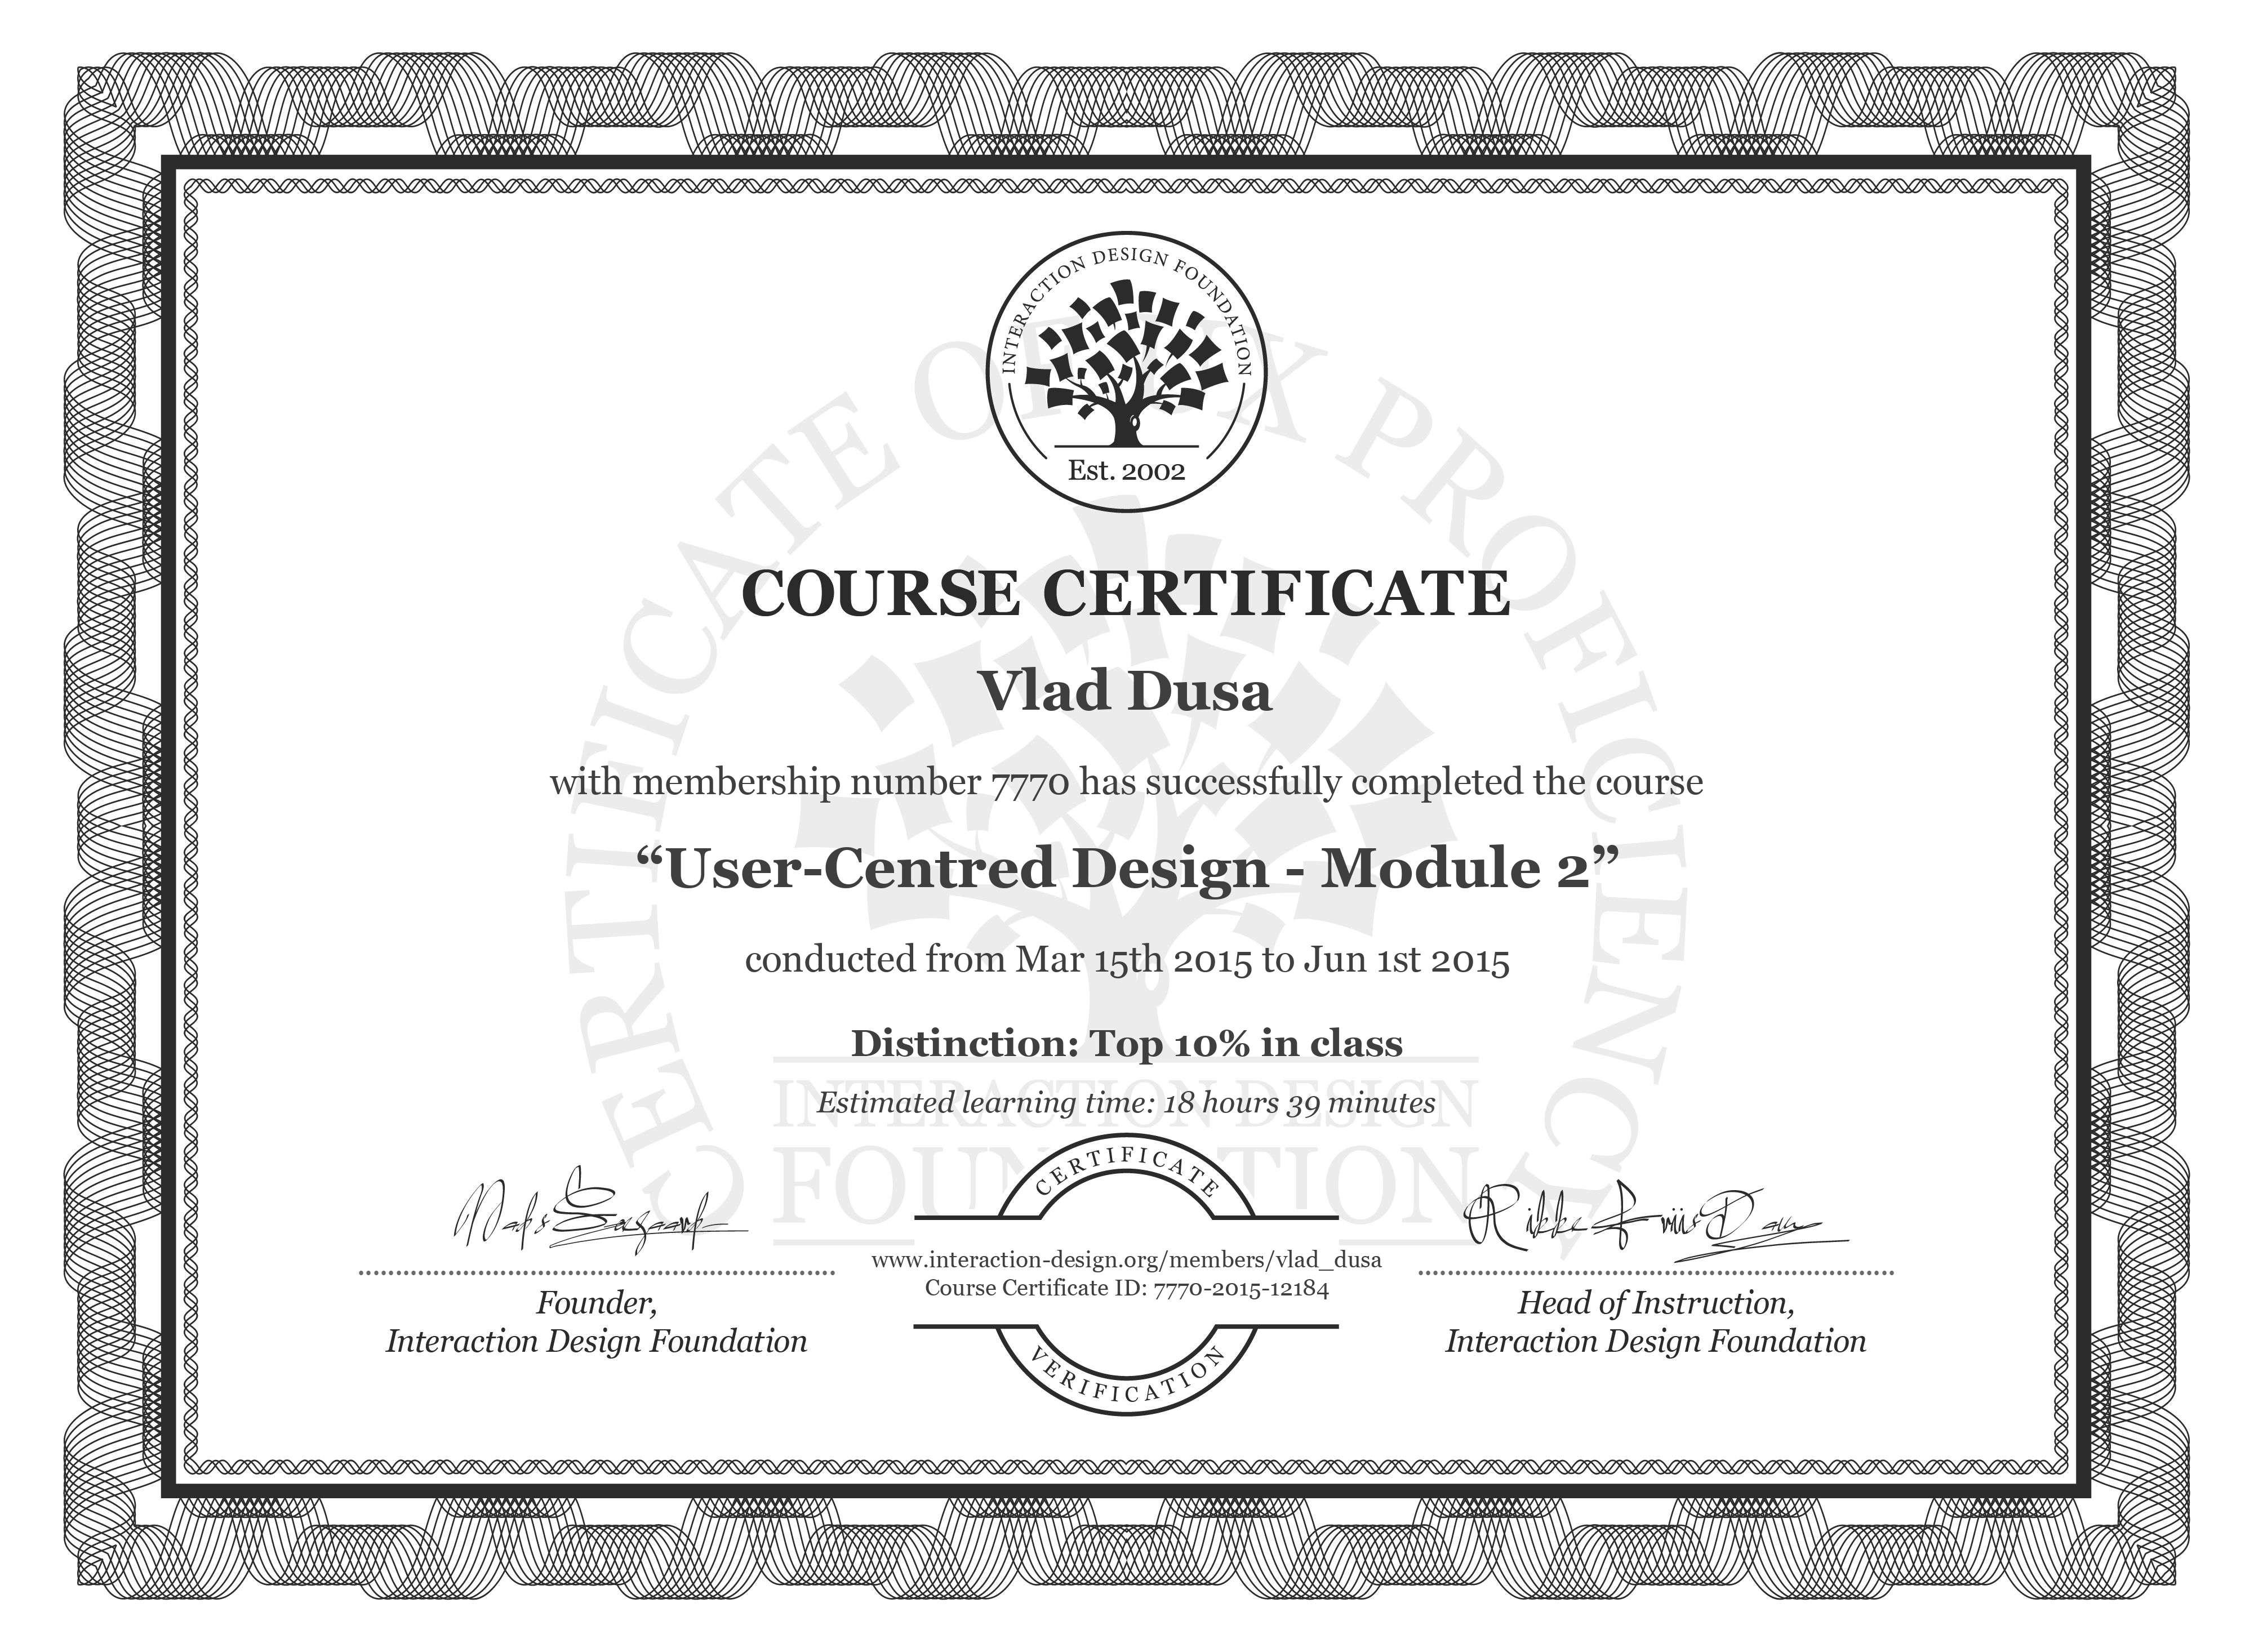 Vlad Dusa: Course Certificate - User-Centred Design - Module 2